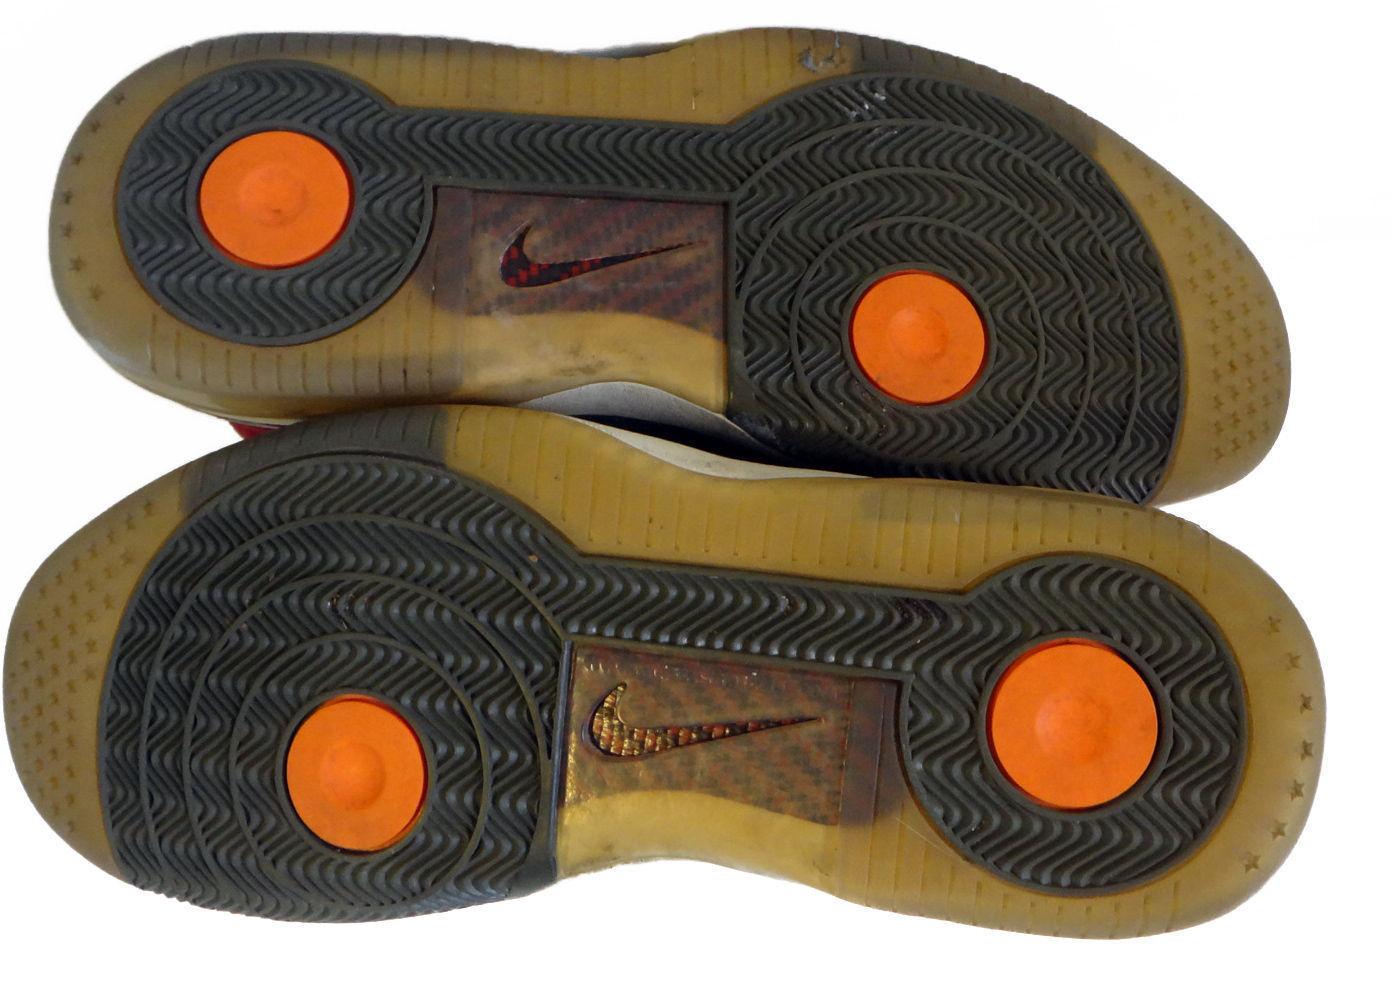 Nike air air Nike force 25 af25 uns 12 46 eur patent glänzende leder rot - blau 0ca73f